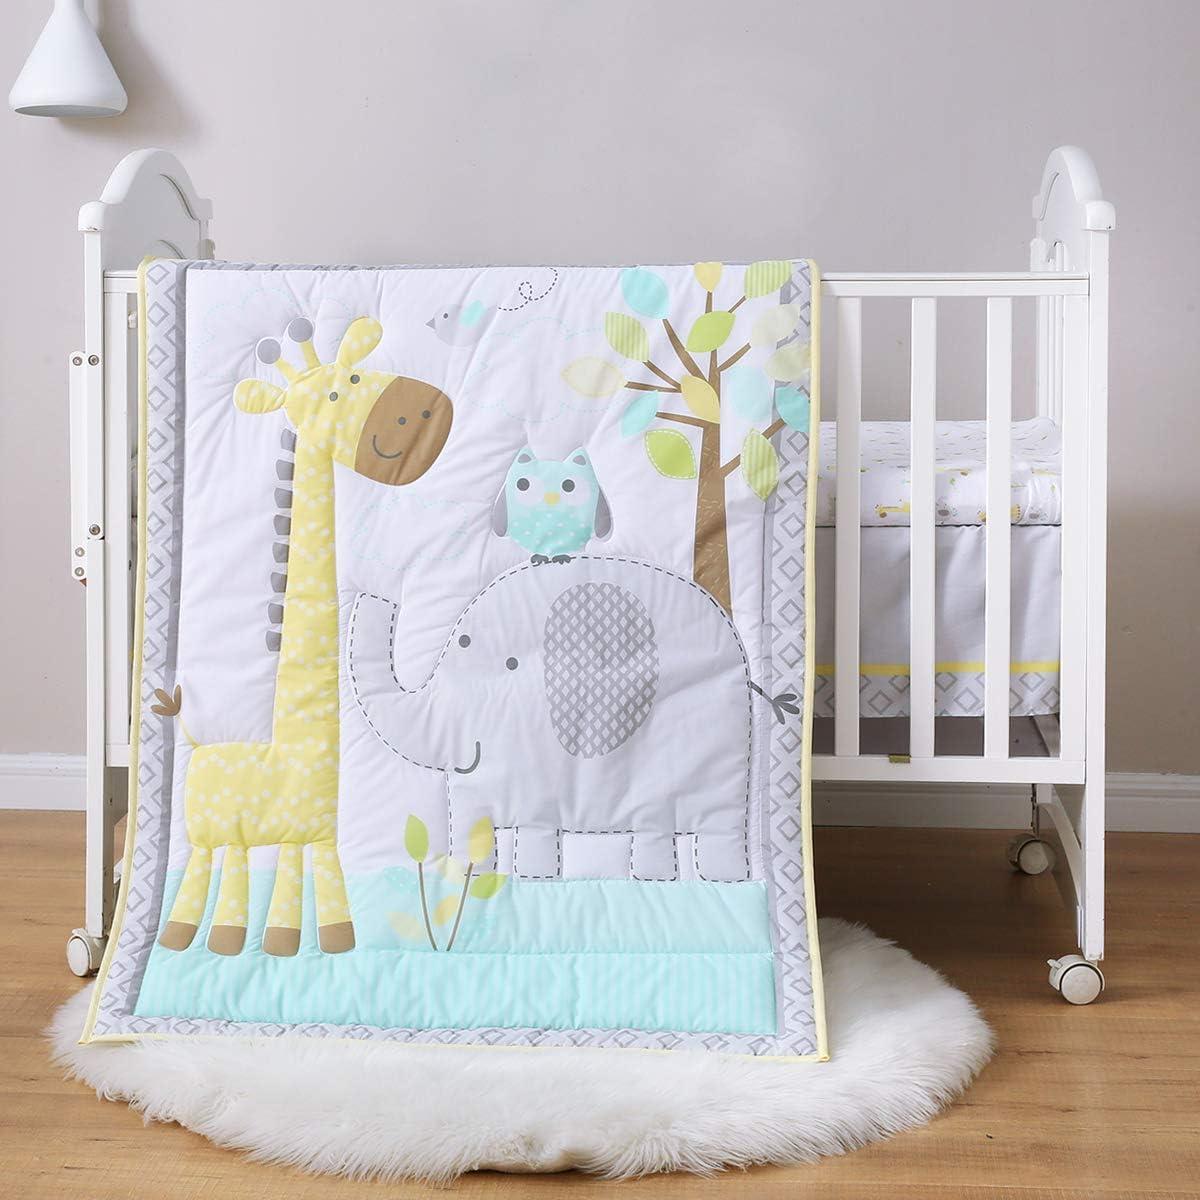 SpringBaby Crib Bedding Set for boy Girl, 3-Piece 100% Soft Natural Cotton Baby Bedding Set, Portable Standard Crib Bedding Set Neutral